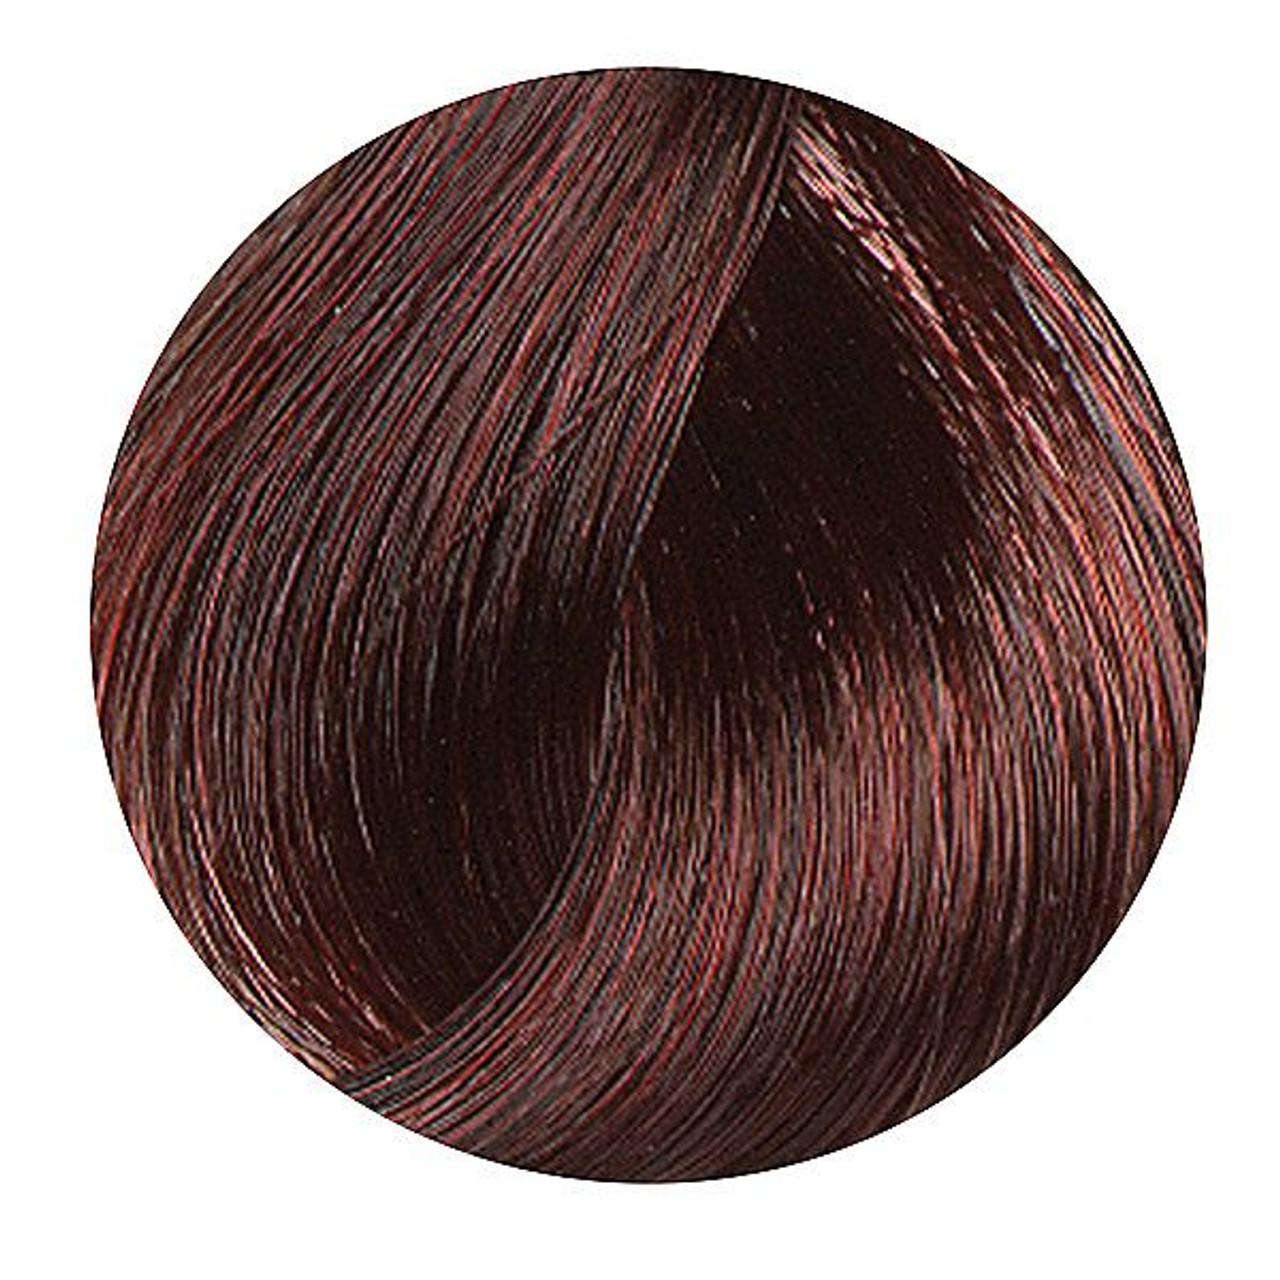 Clairol 2RRV - Dark Intense Red Violet hair color